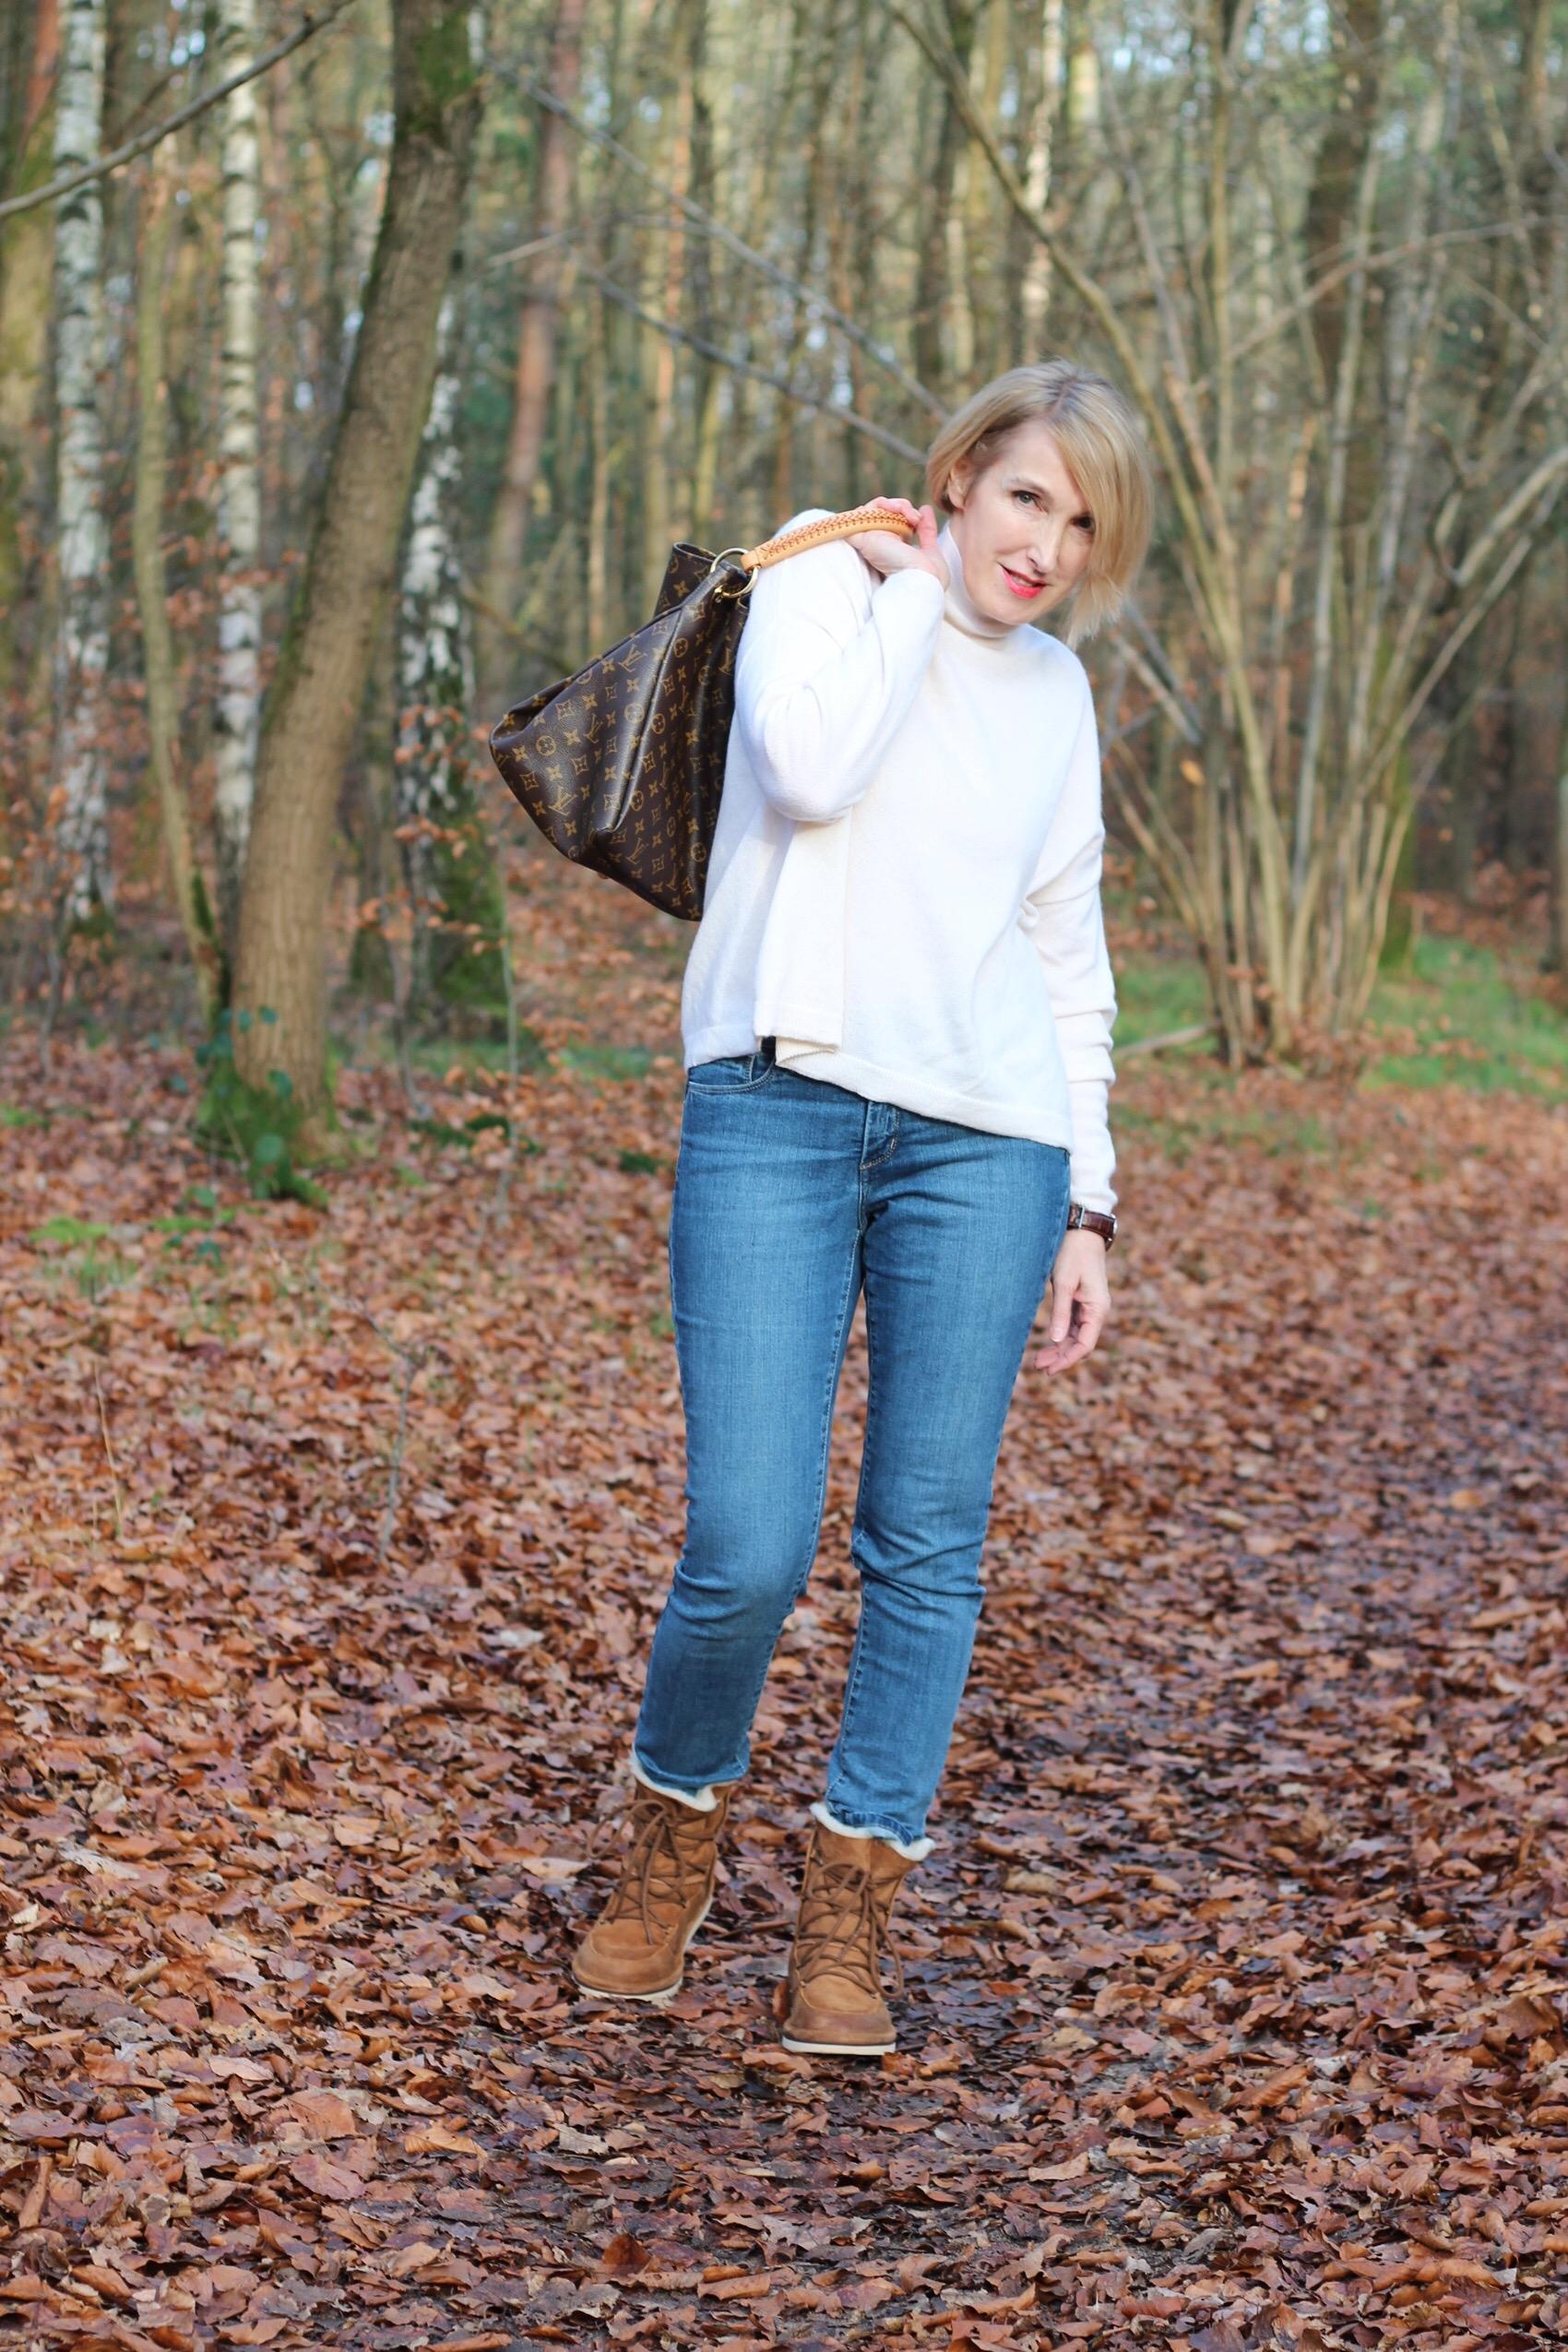 glamupyourlifestyle Winterschuhe wetterfeste-Schuhe Stiefeletten-Winter gefütterte-Schuhe Ü-40-blog ü-50-blog ue-40-mode ue-50